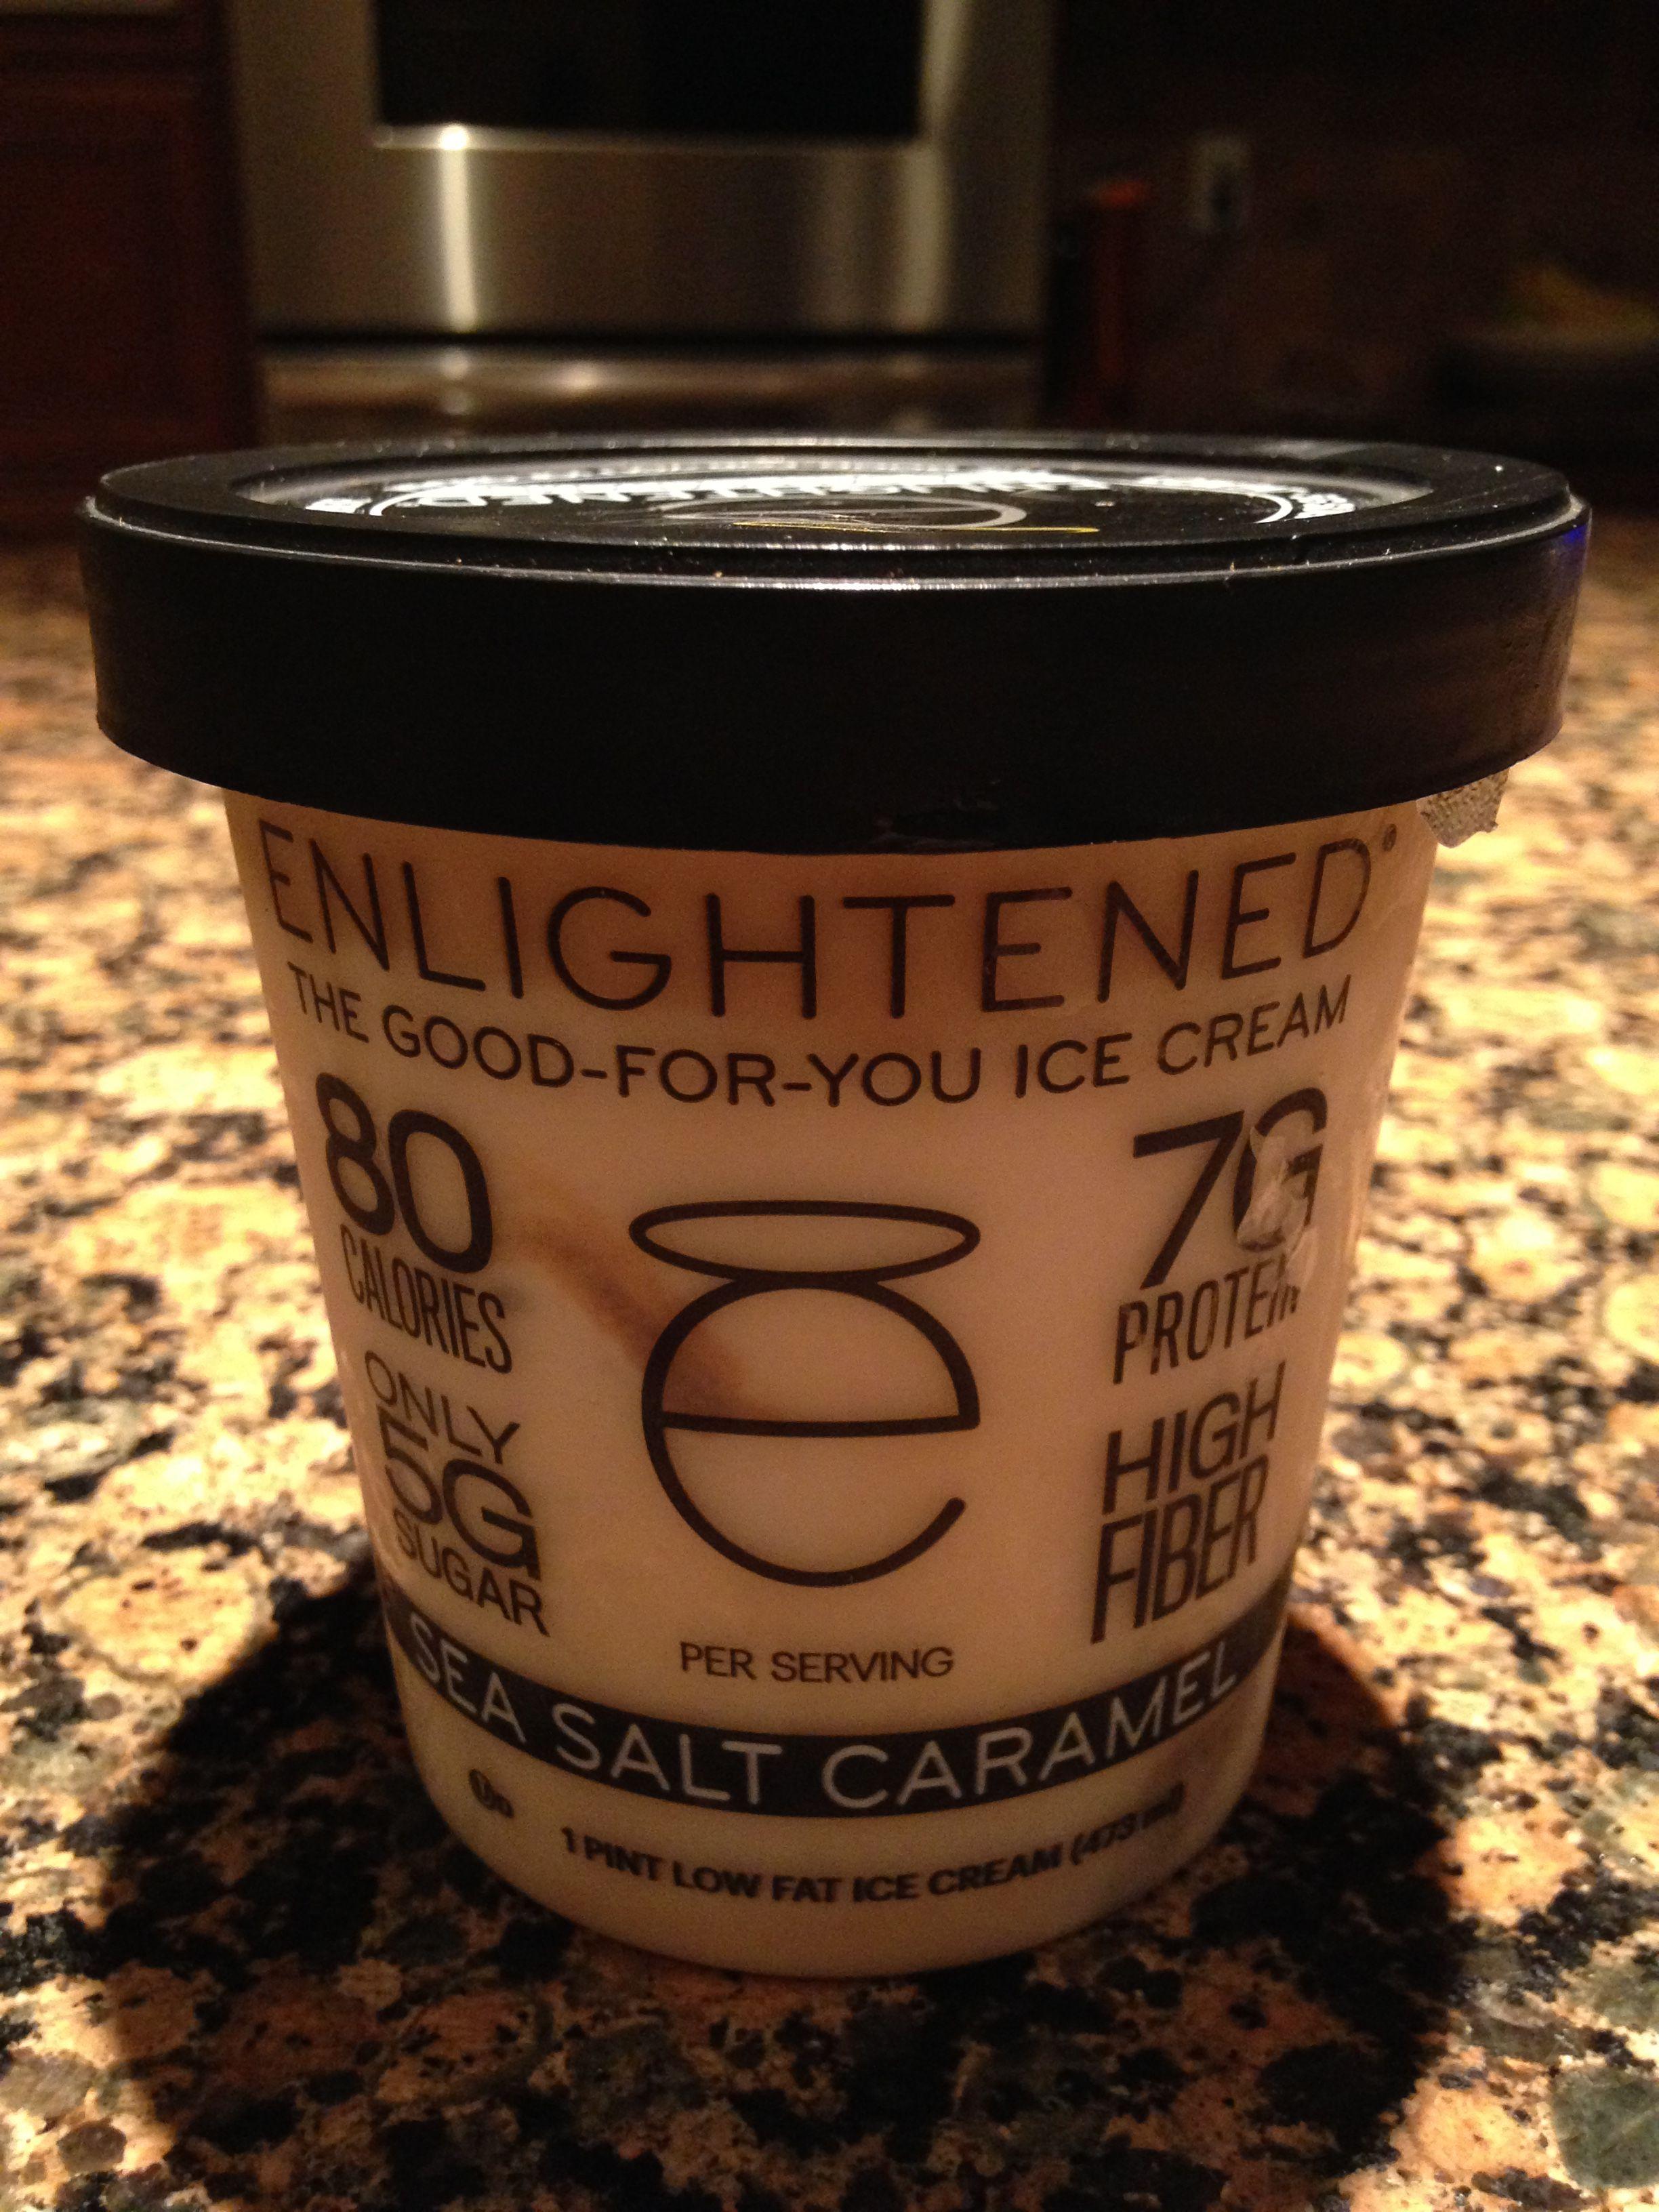 Enlightened Ice Cream Pints Sea Salt Caramel Review